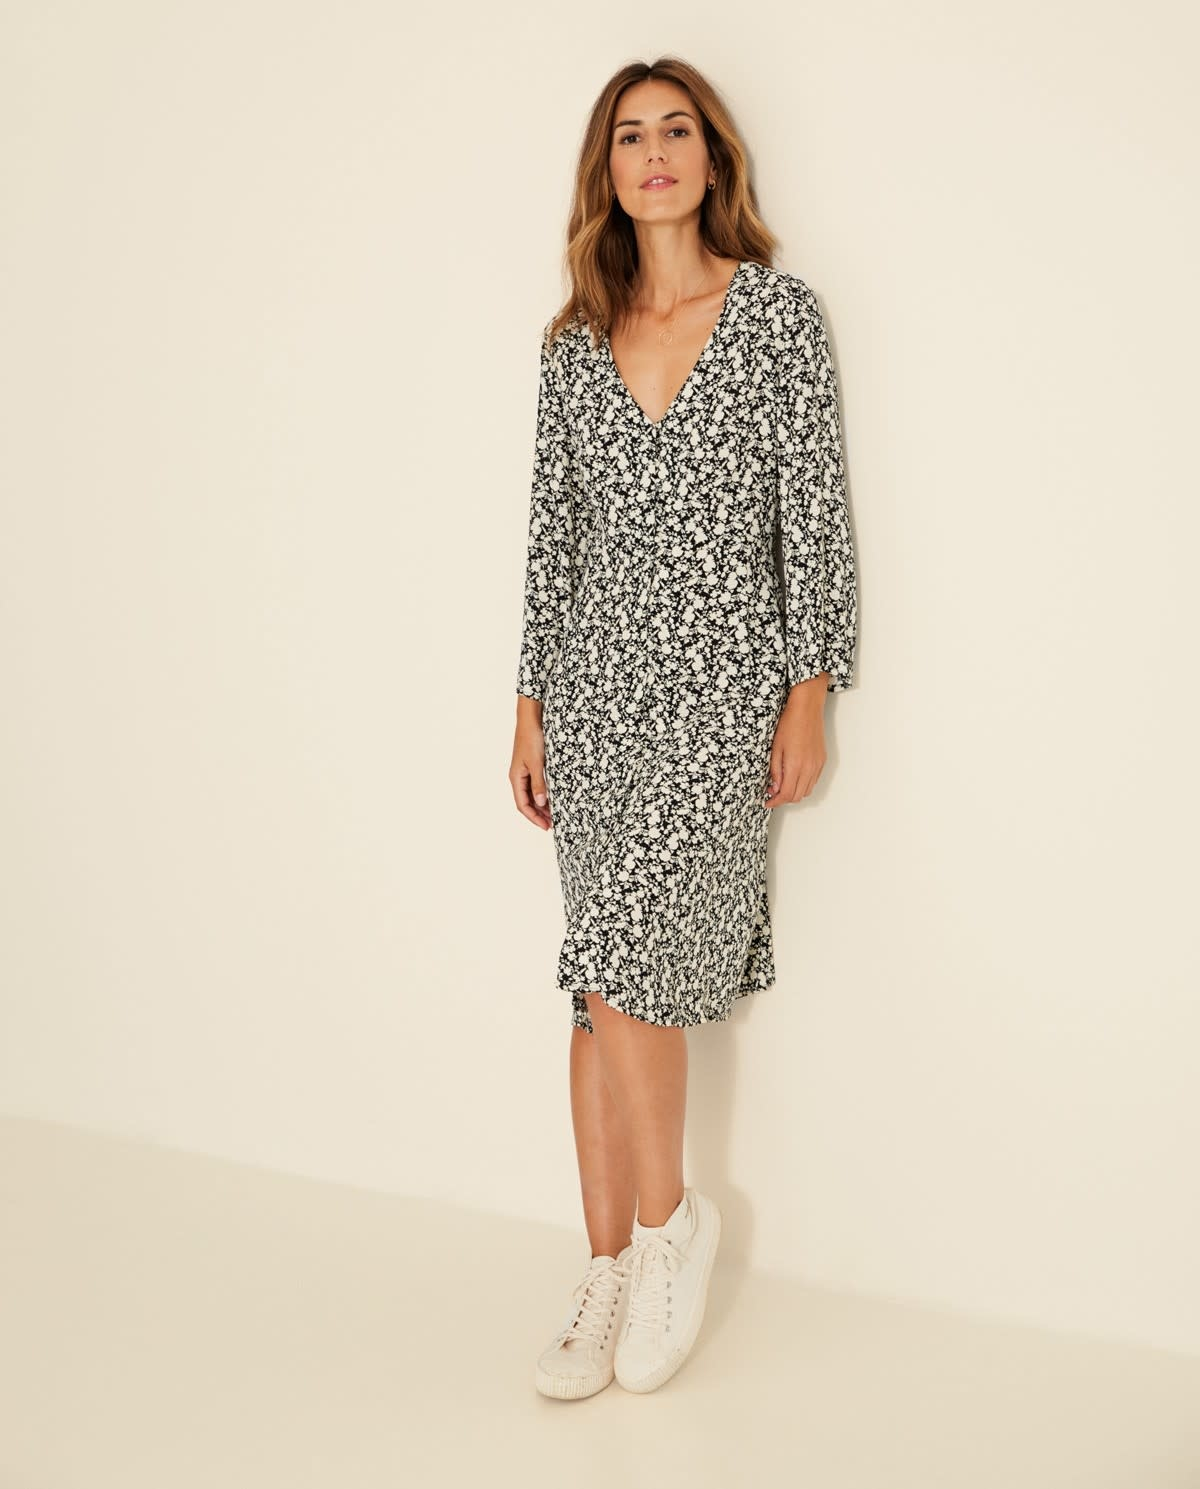 Yerse Long-sleeve floral dress